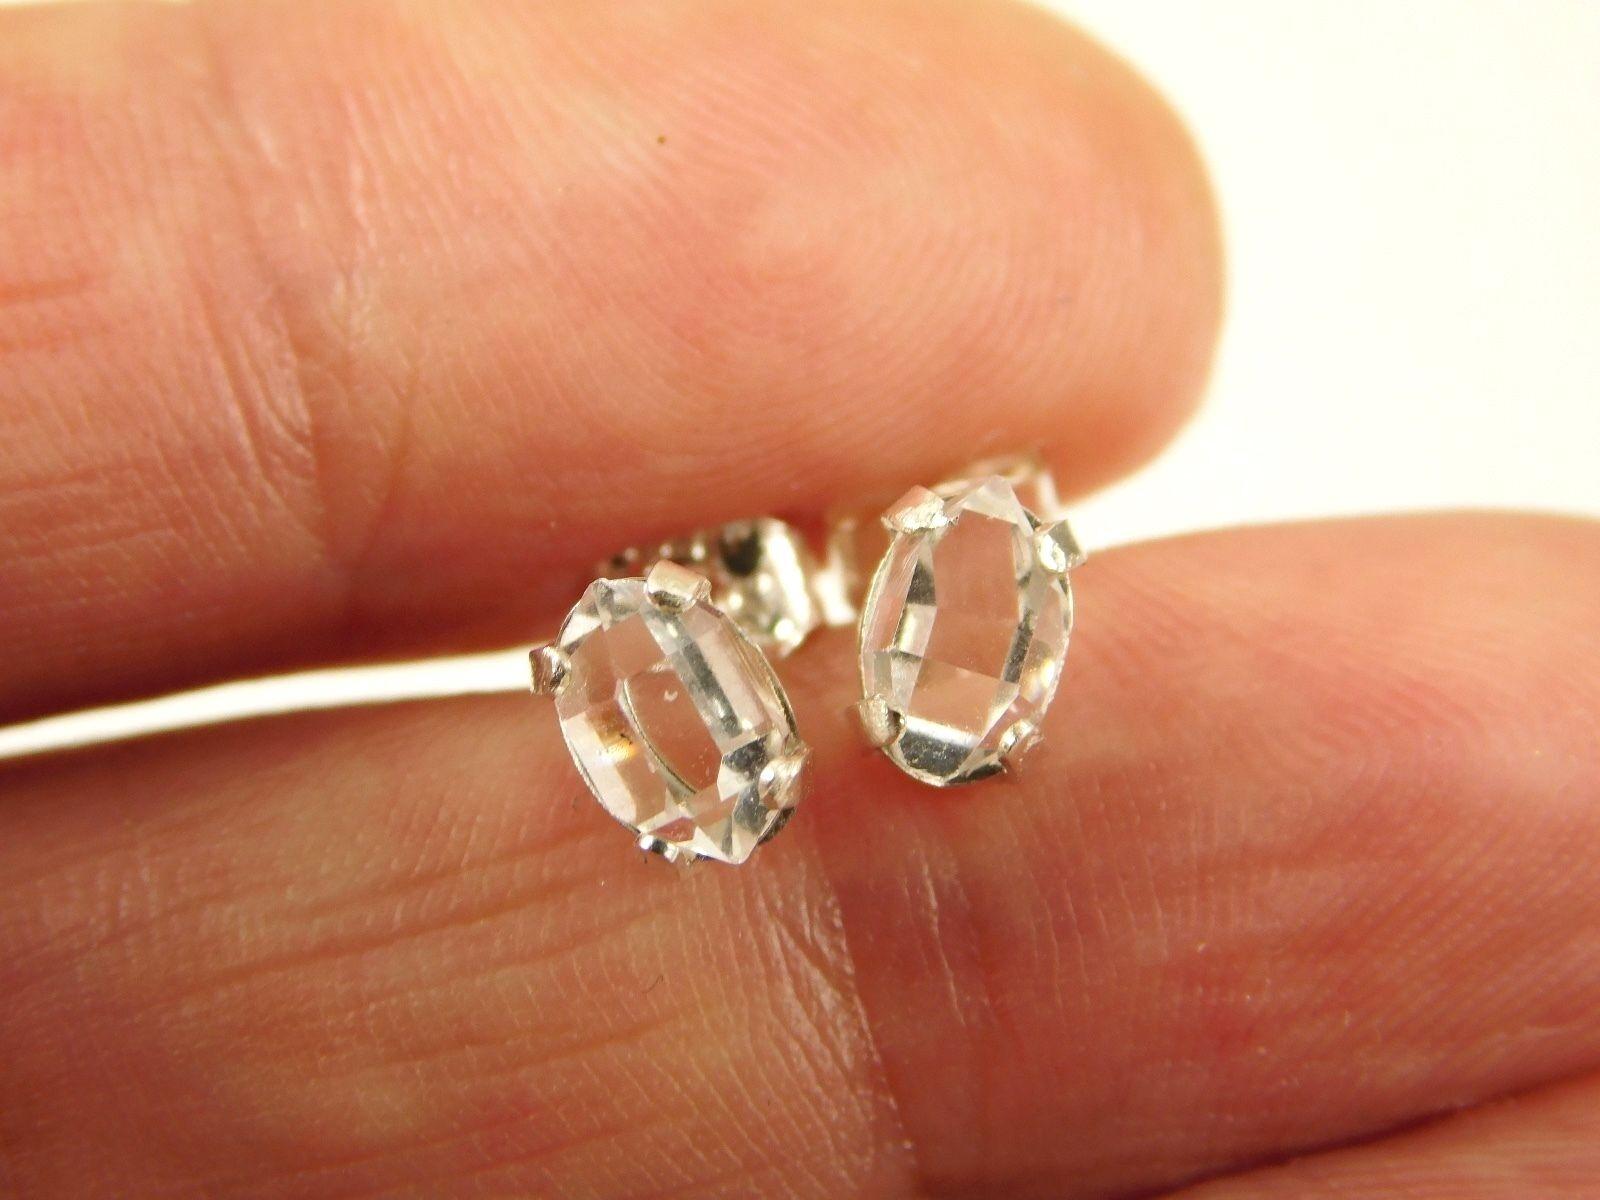 Купить 4x6 mm A+ Grade Herkimer Diamond Crystal Earrings set in Sterling Silver Q1